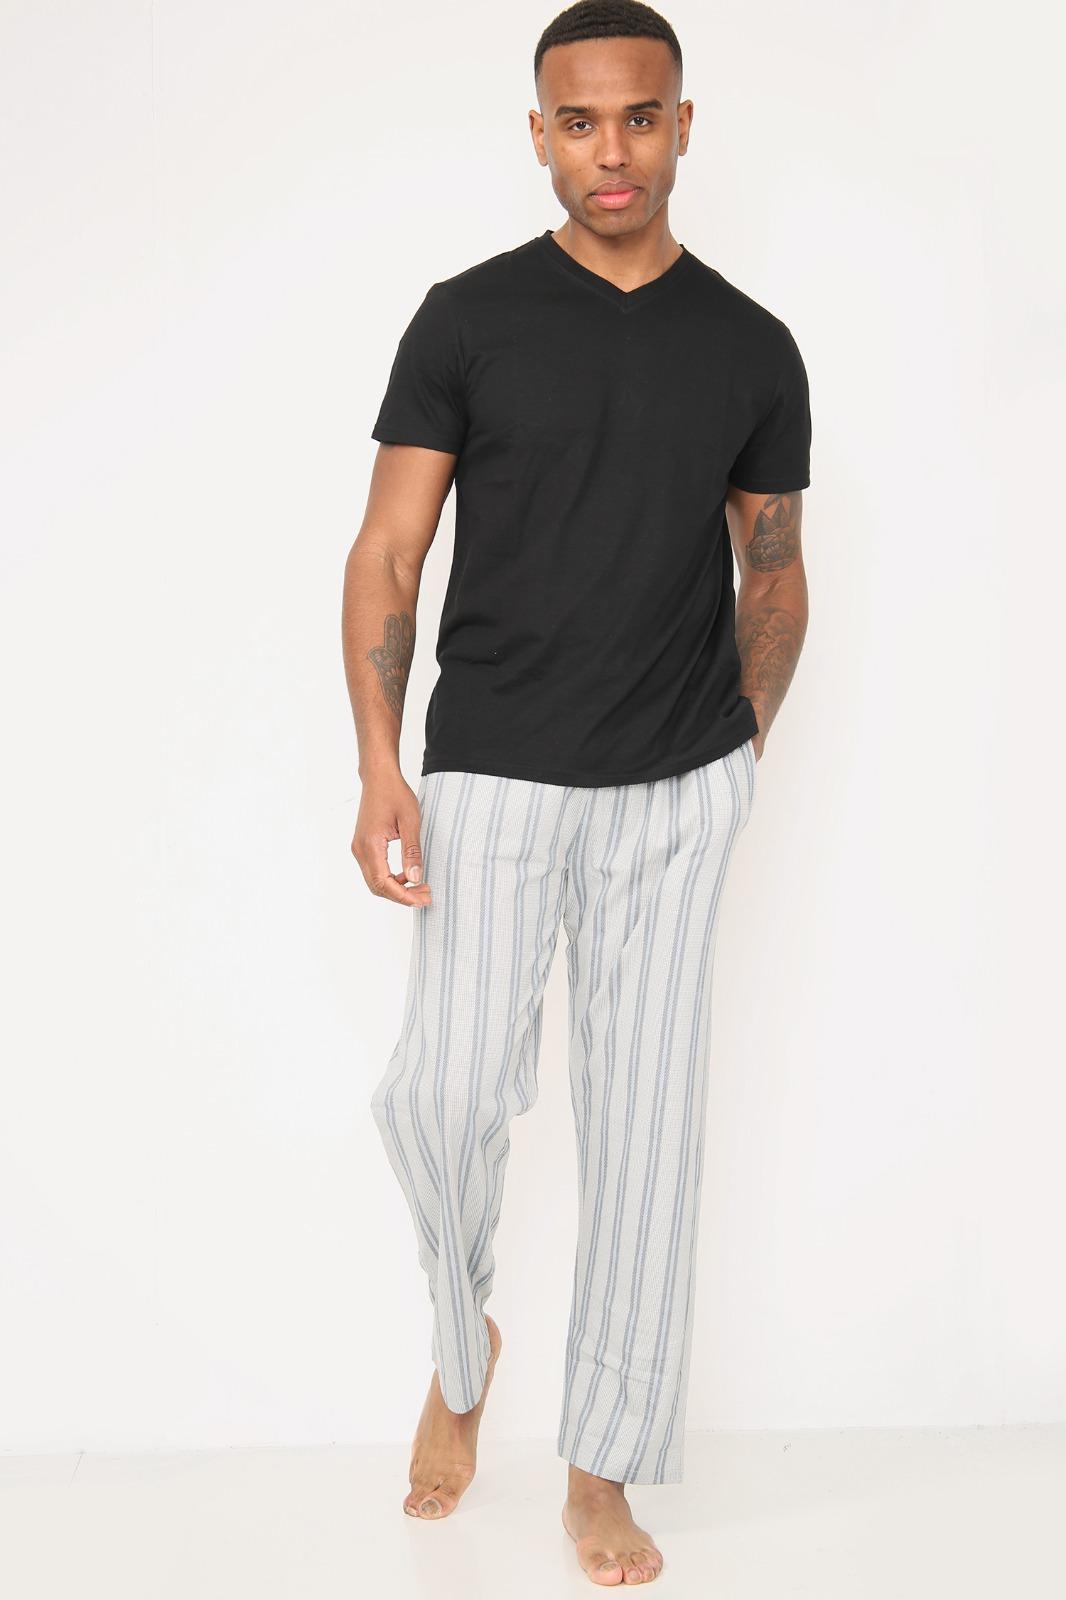 Mens V-Neck Jersey Short Sleeve Top With Jersey Aop Stripe Pant